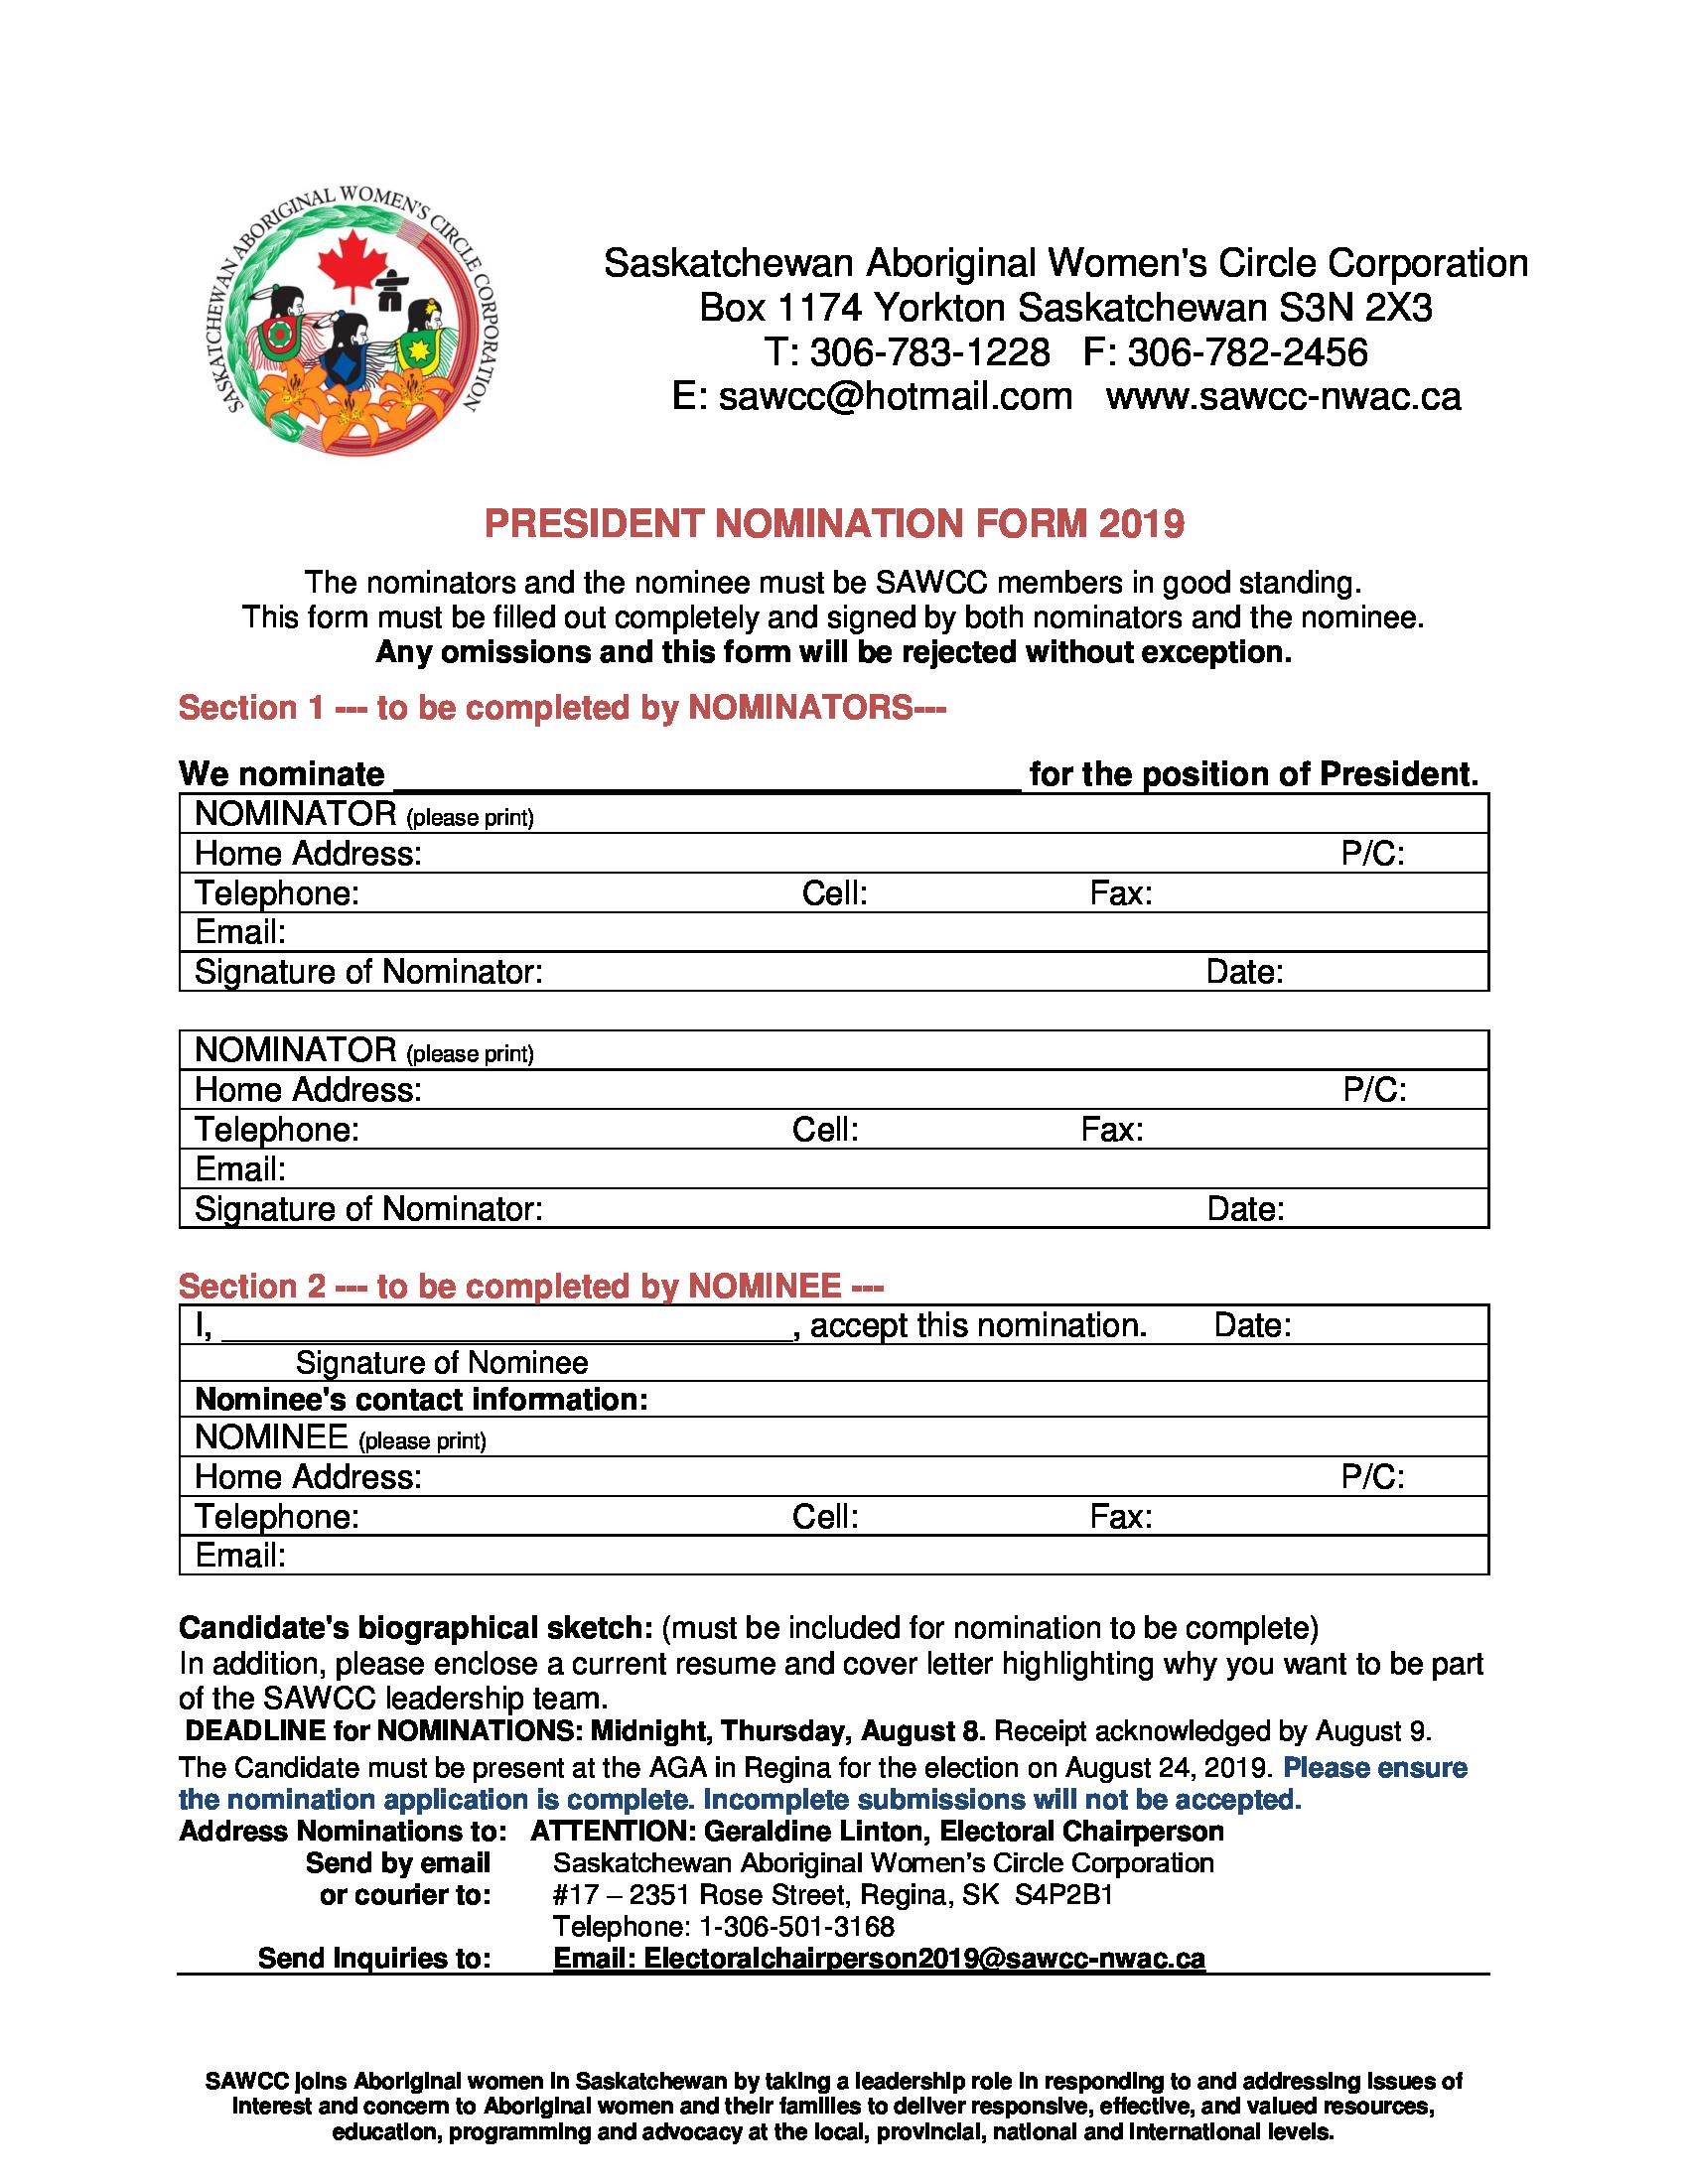 President Nomination Form -